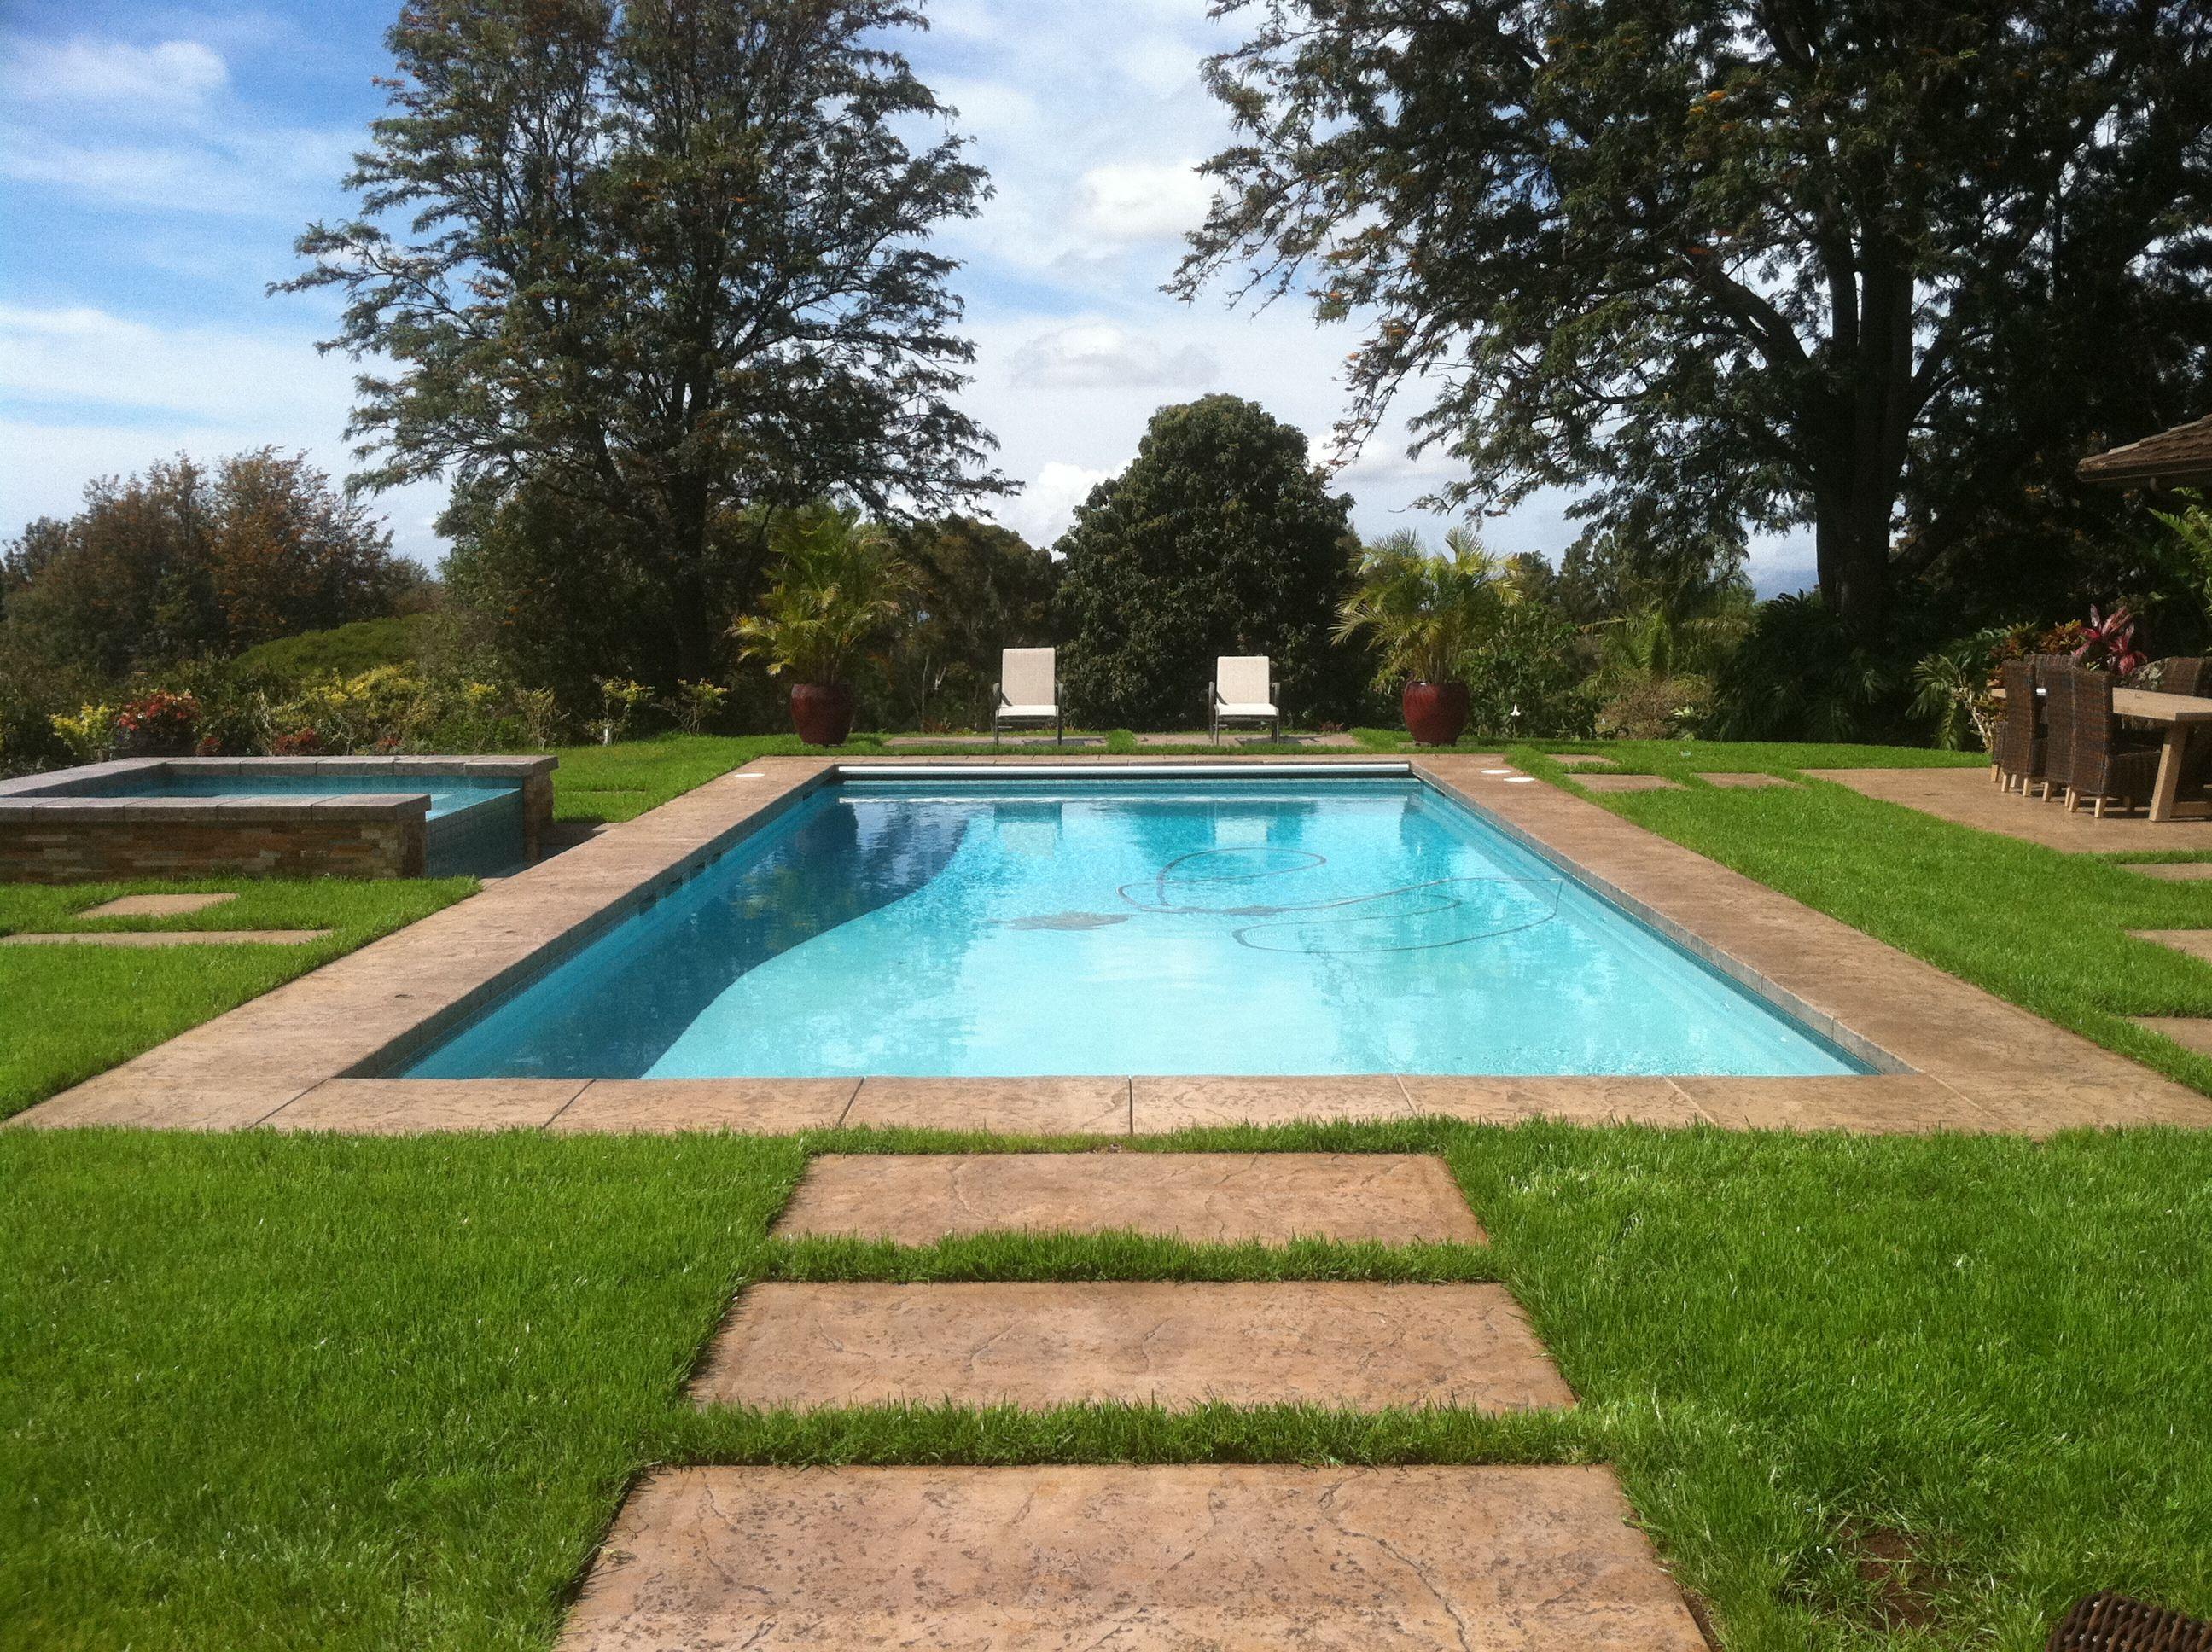 Classic Backyard Pool For Family Fun! Bimini Teal Hydrazzo, Stamped Concrete  Coping U0026 Decking